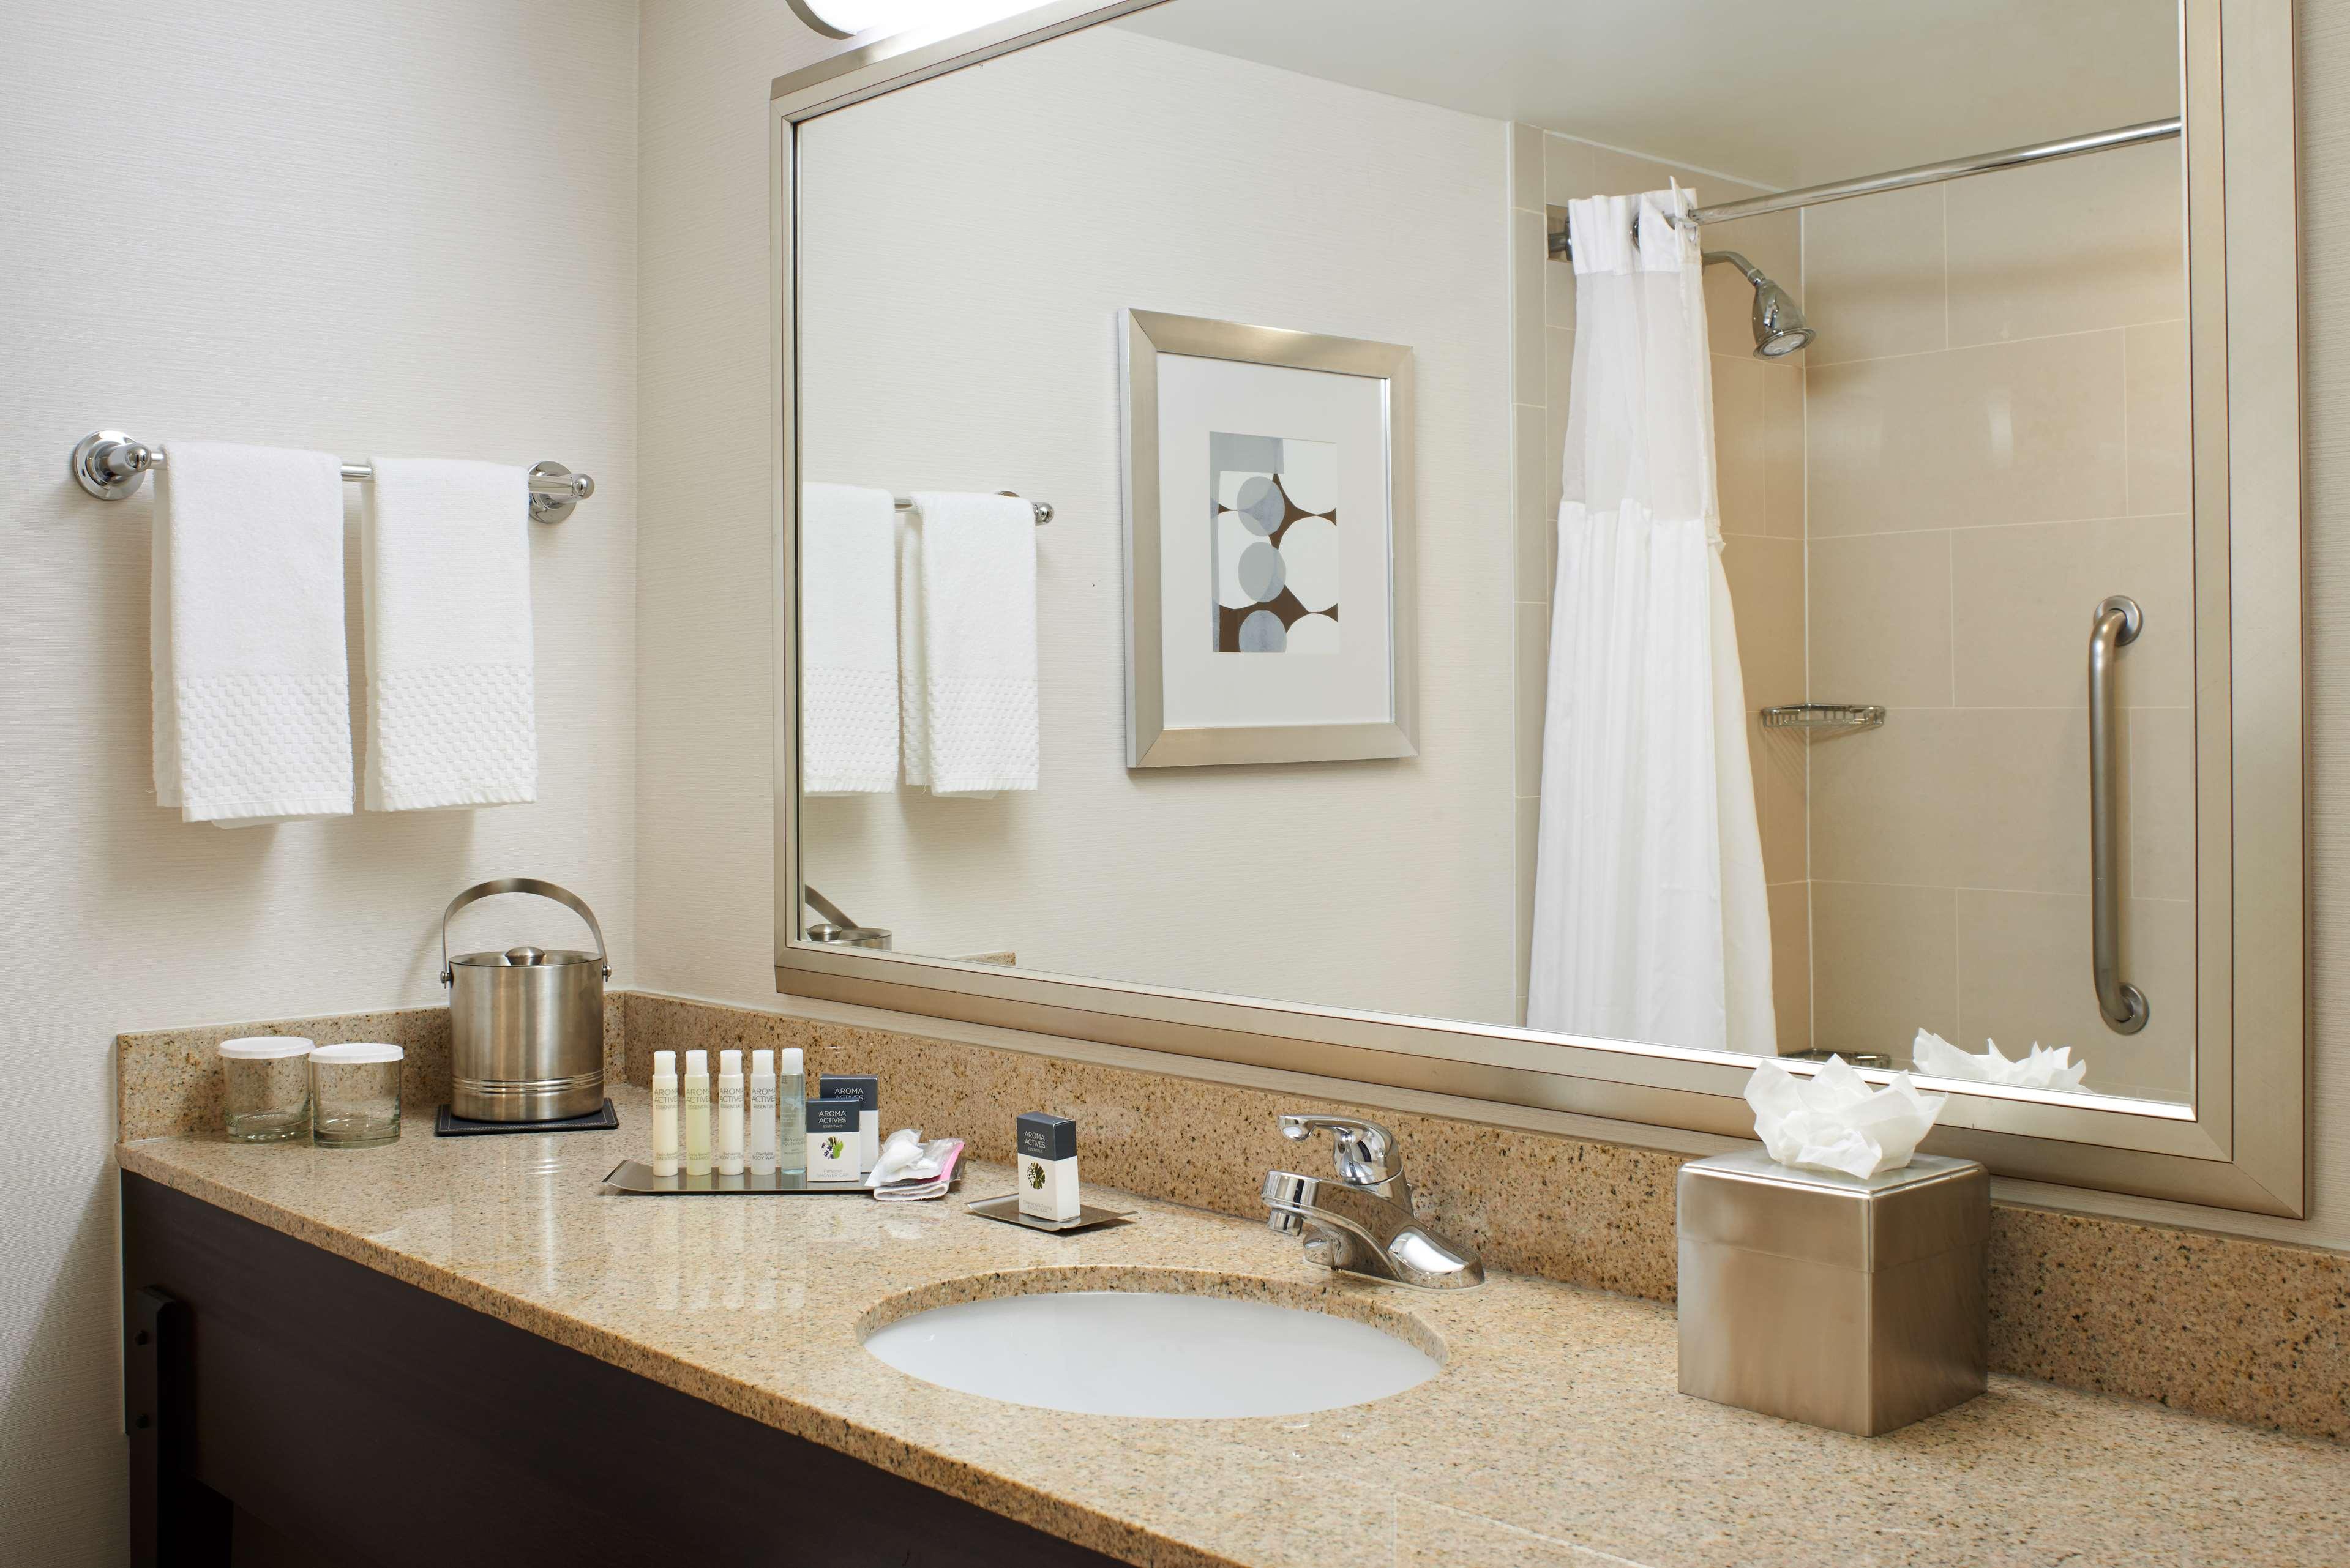 DoubleTree by Hilton Hotel Detroit - Dearborn image 13